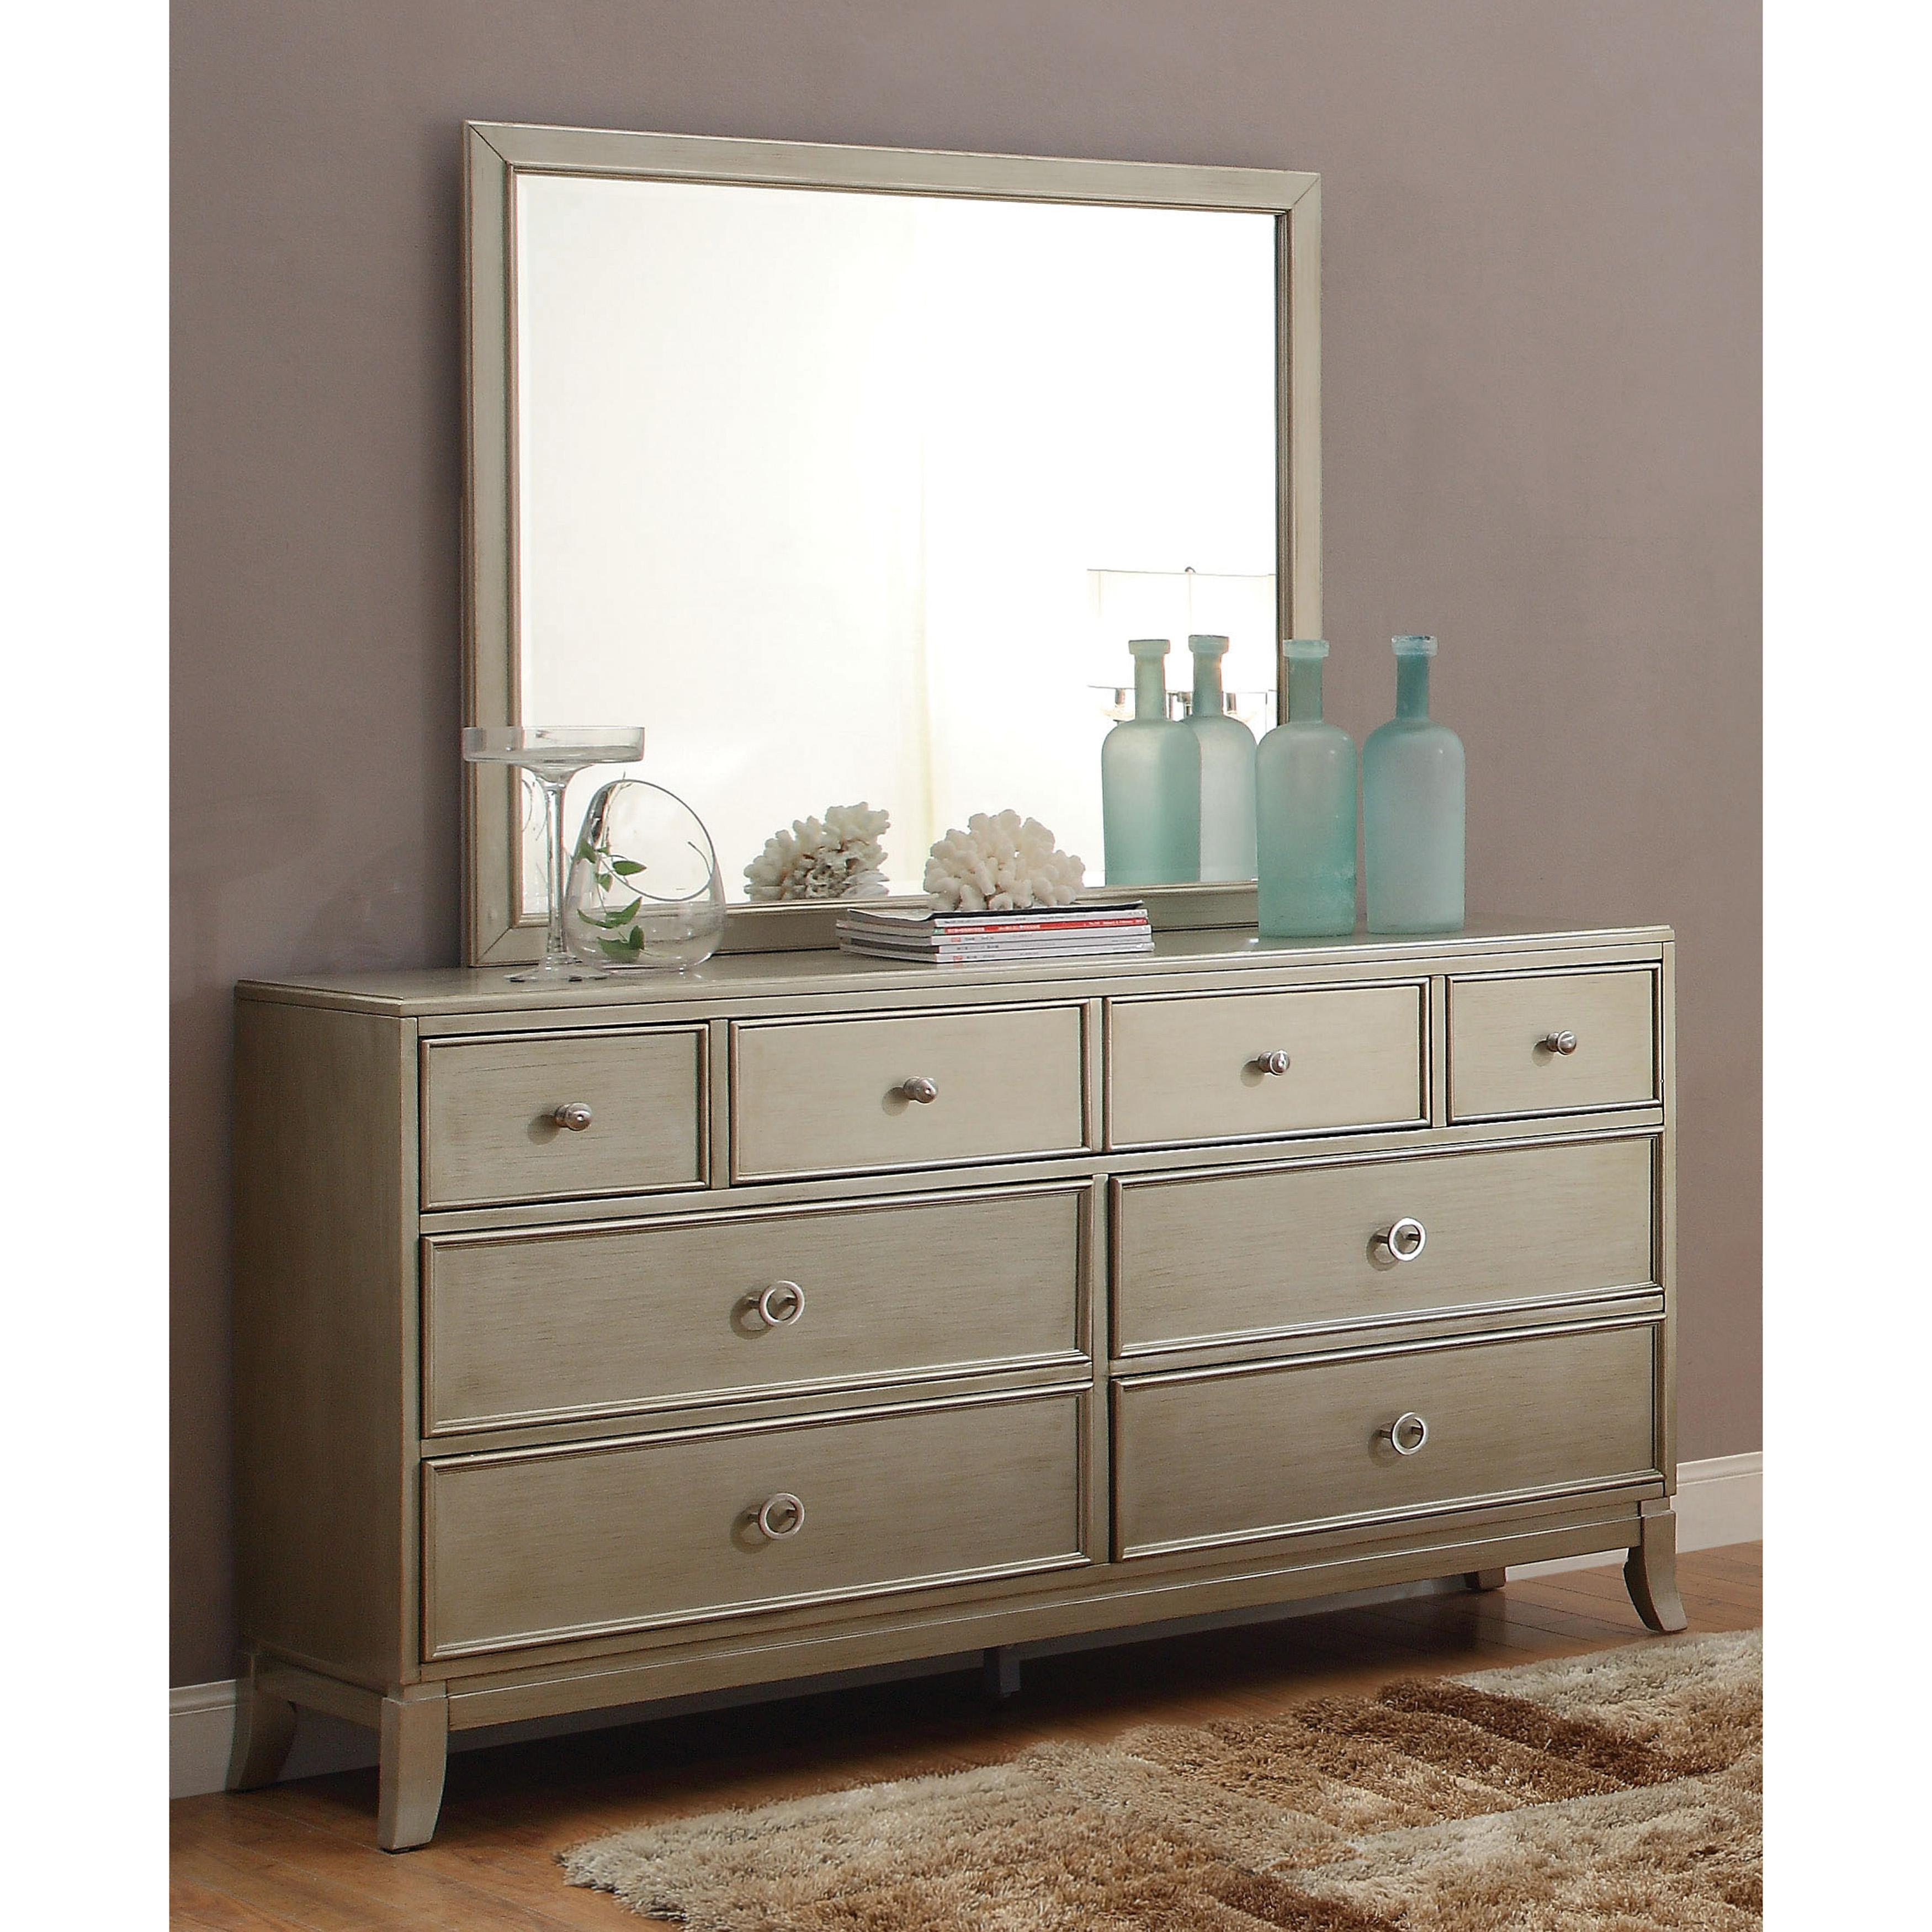 Furniture of America Ideena Silver Gray Finish ORing Handle 8Drawer Dresser